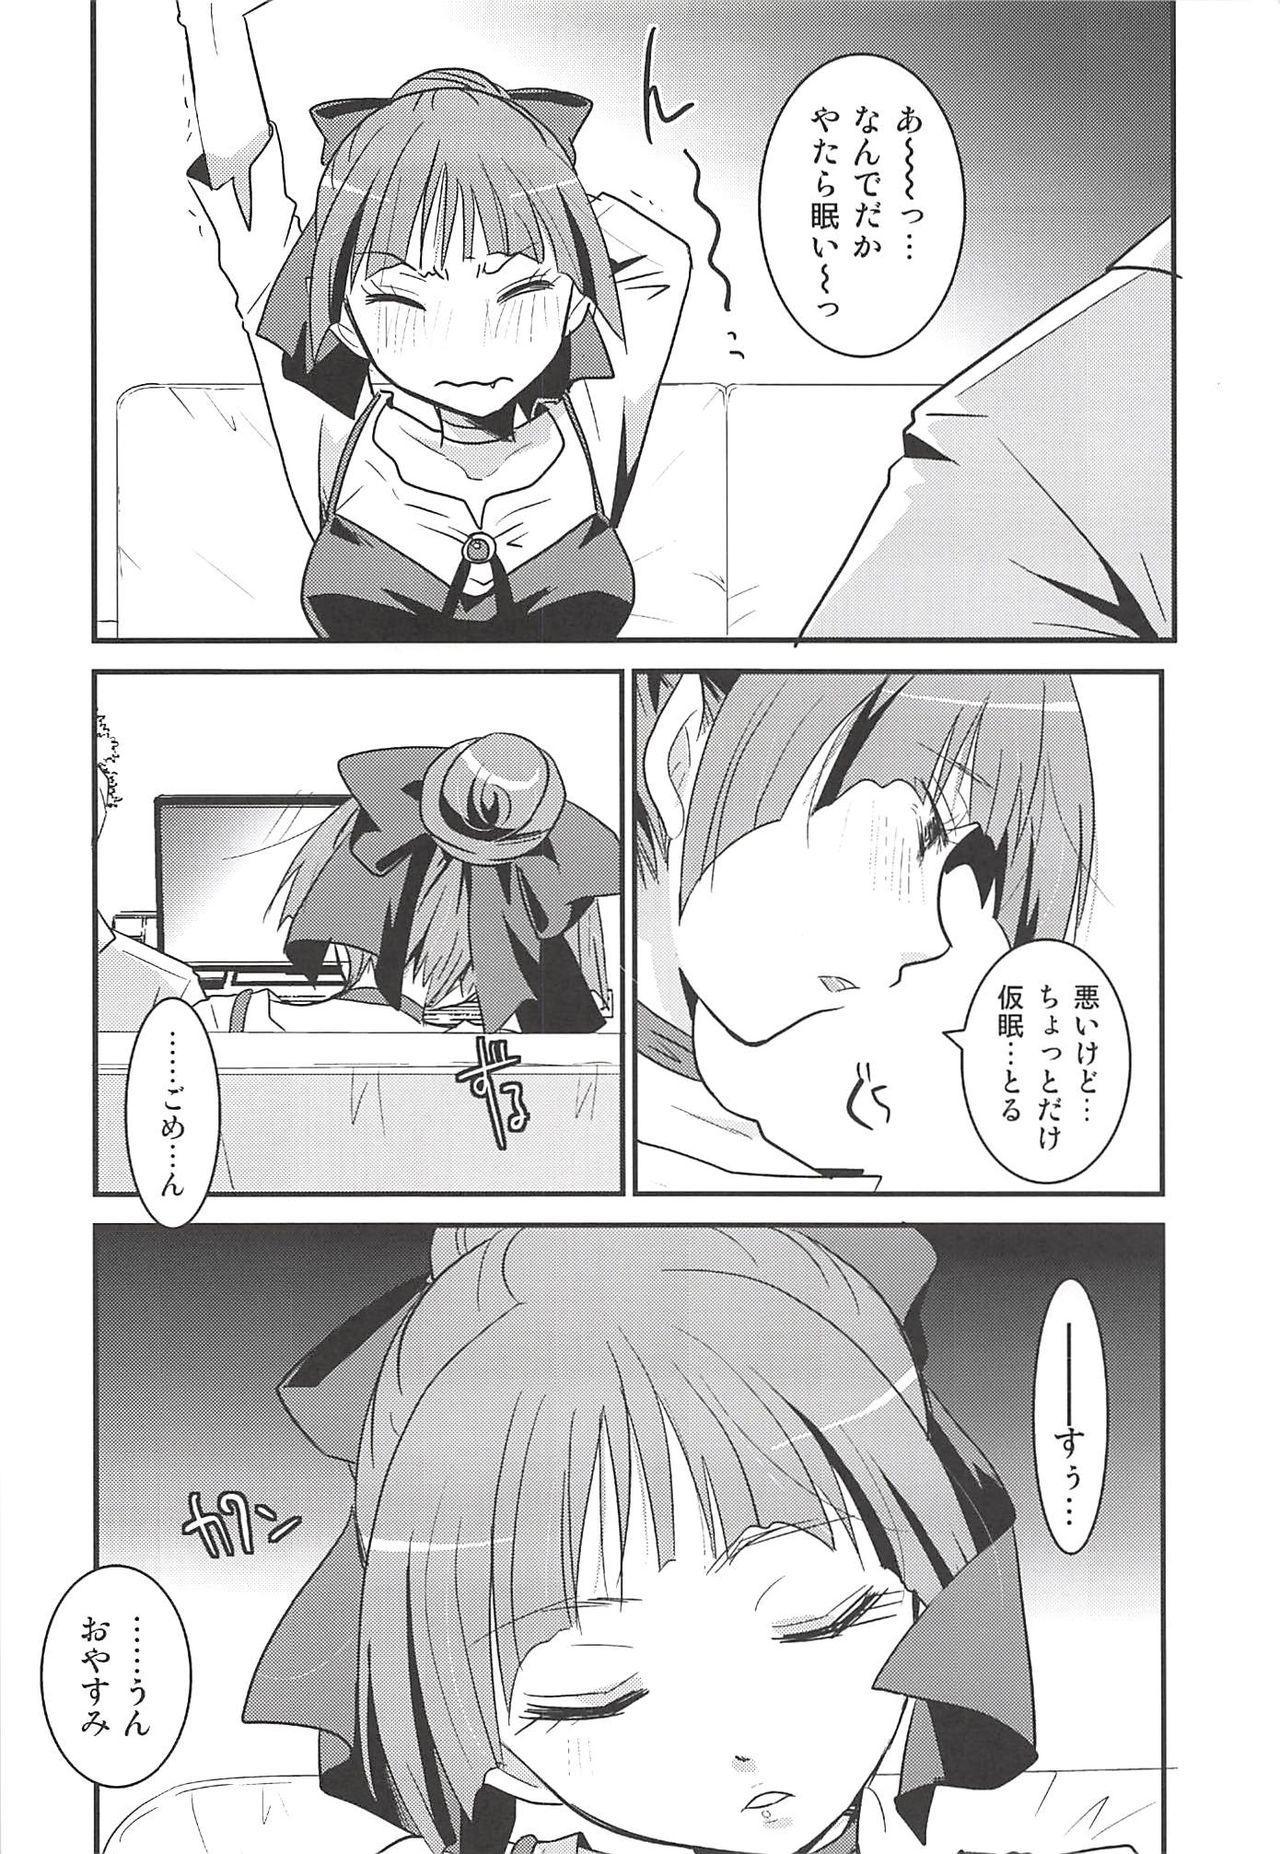 Neko Musume Suikan 8